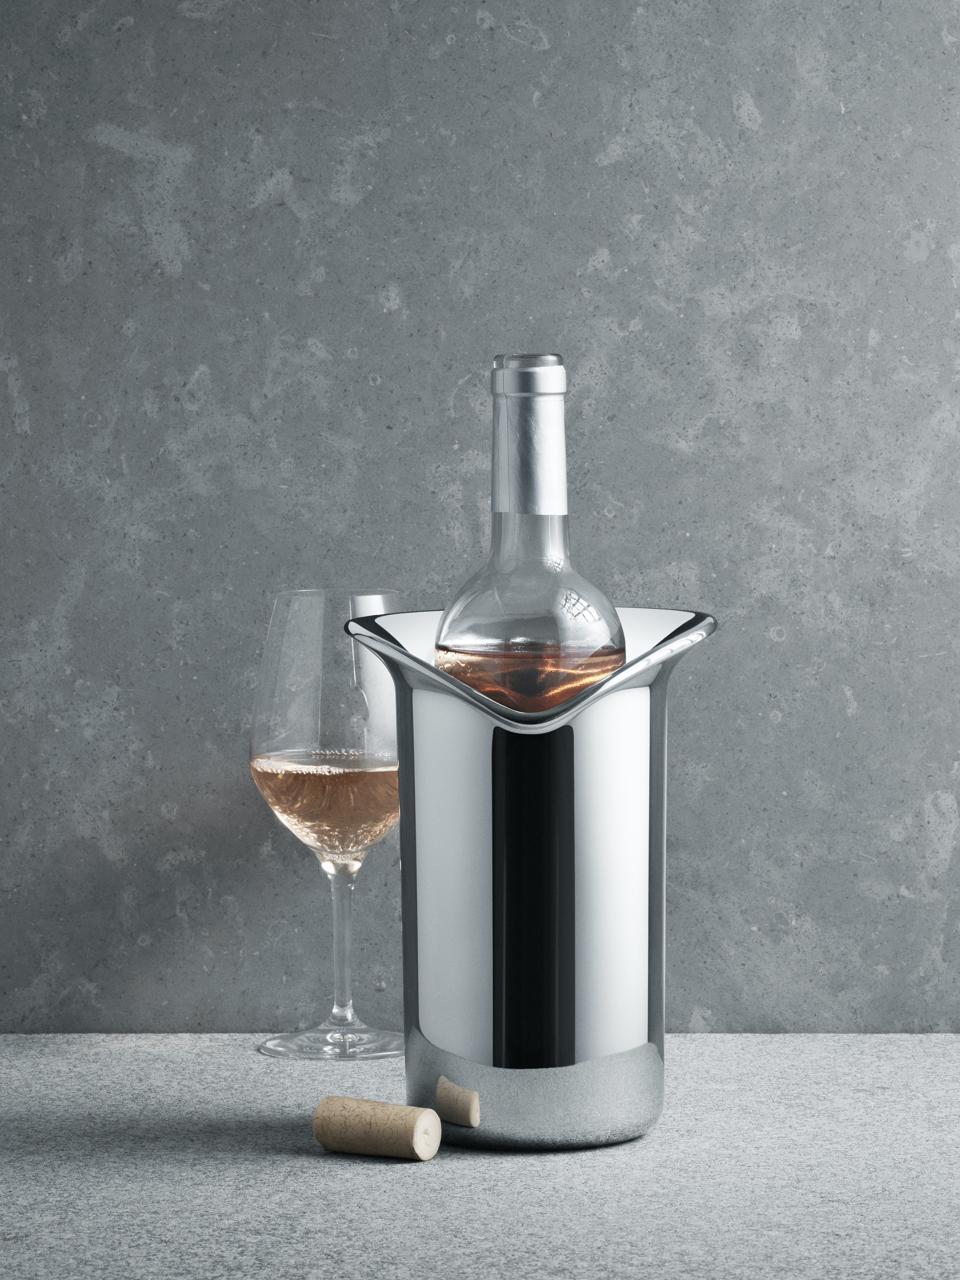 Georg Jenson Wine and Bar Cooler Wine Chiller